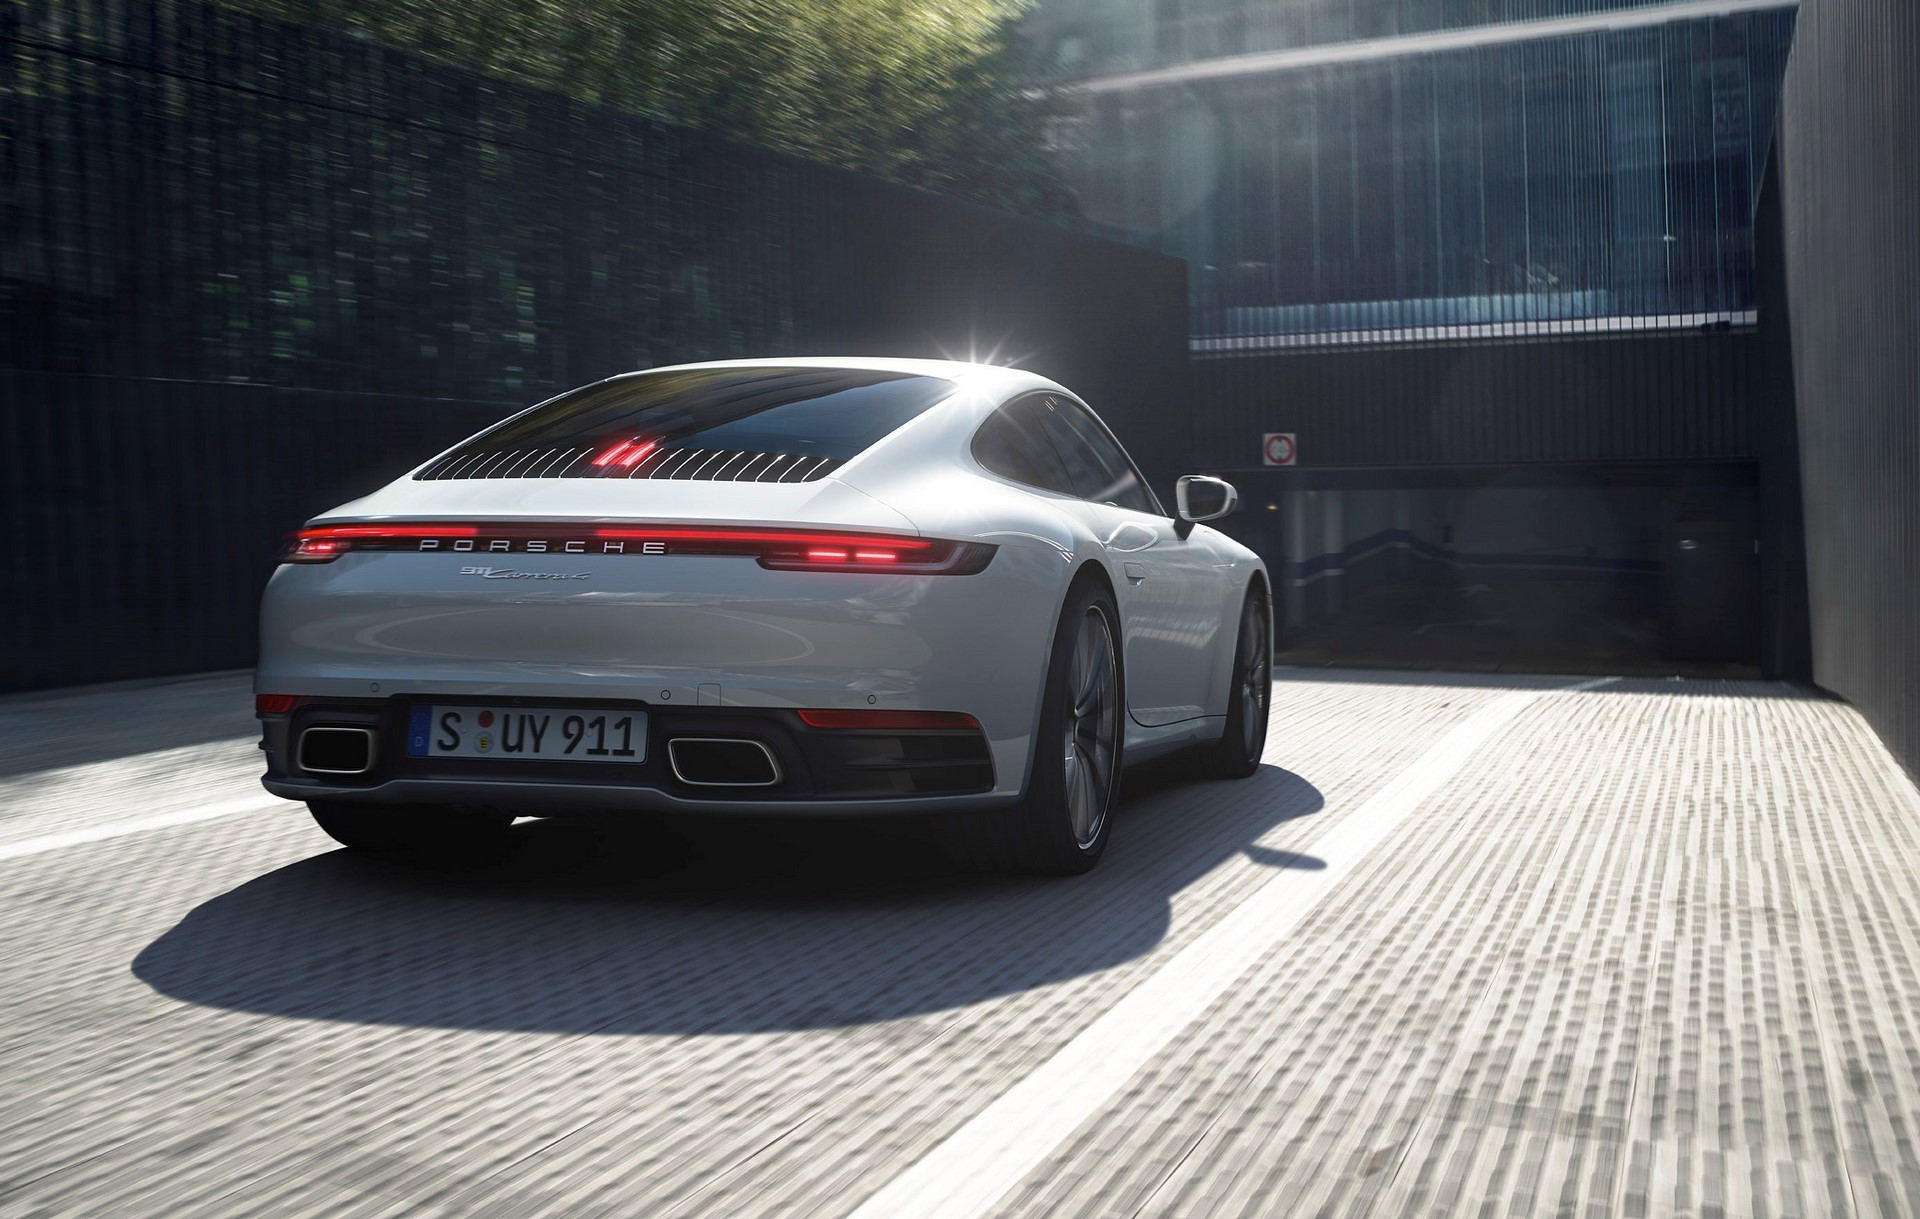 Porsche-911-Carrera-4-Coupe-and-Cabriolet-2020-3